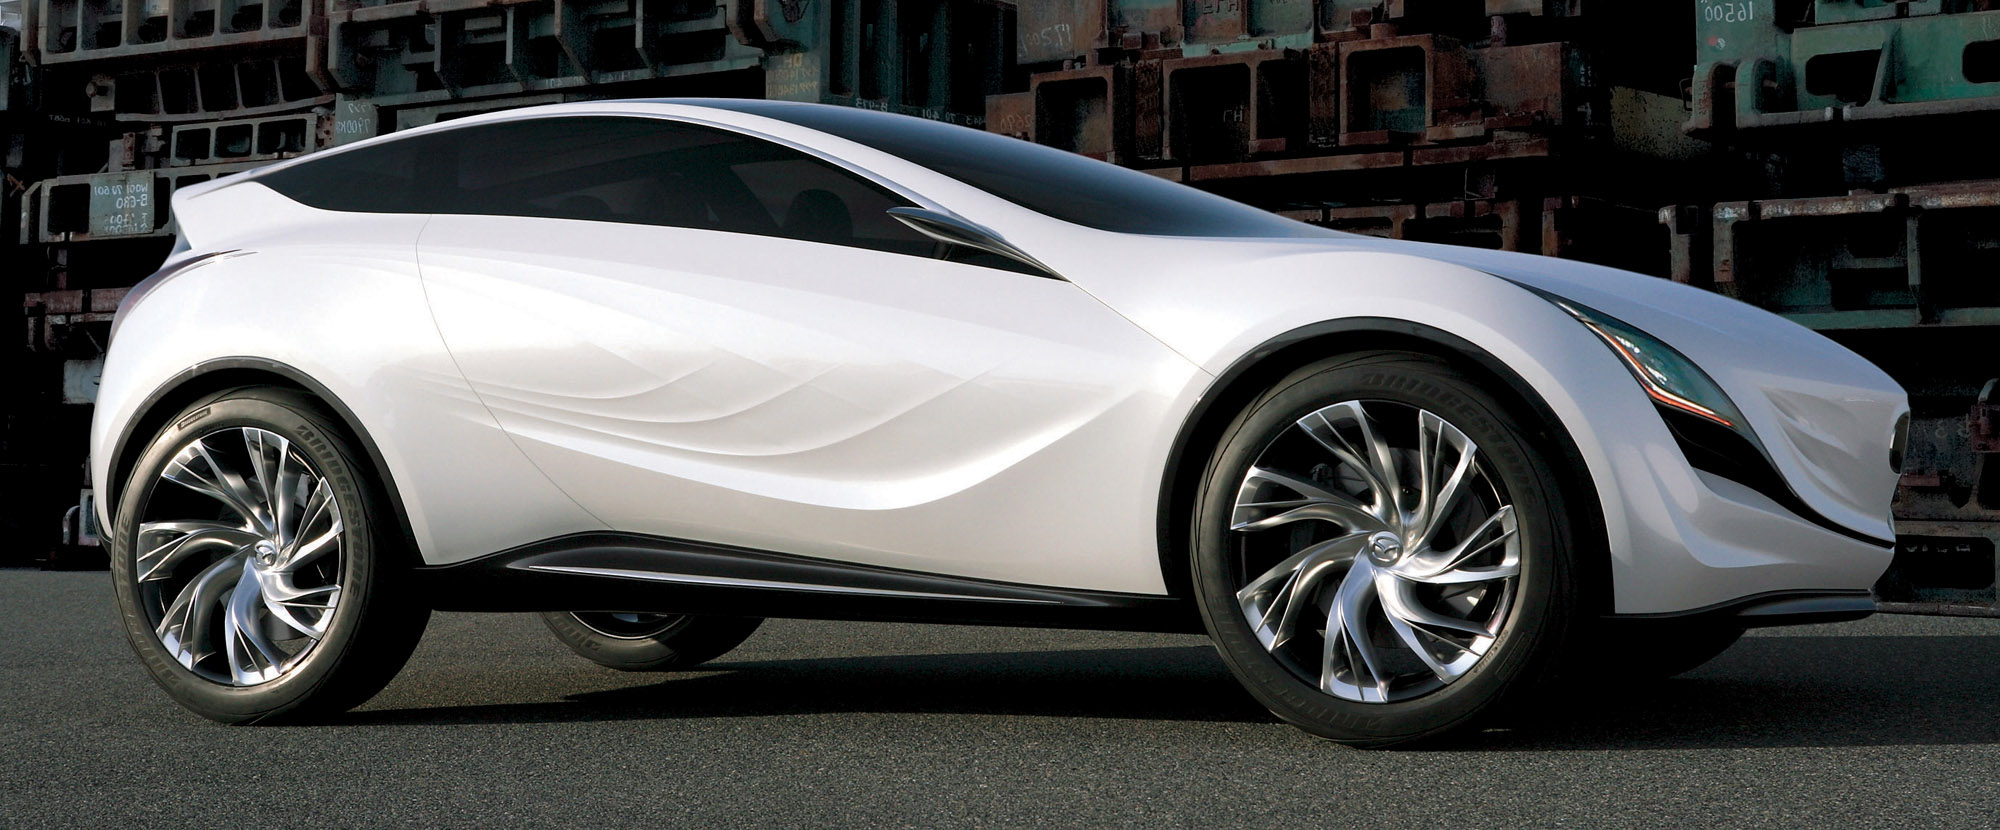 https://www.automobilesreview.com/gallery/mazda-kazamai-concept/mazda-kazamai-concept-08.jpg